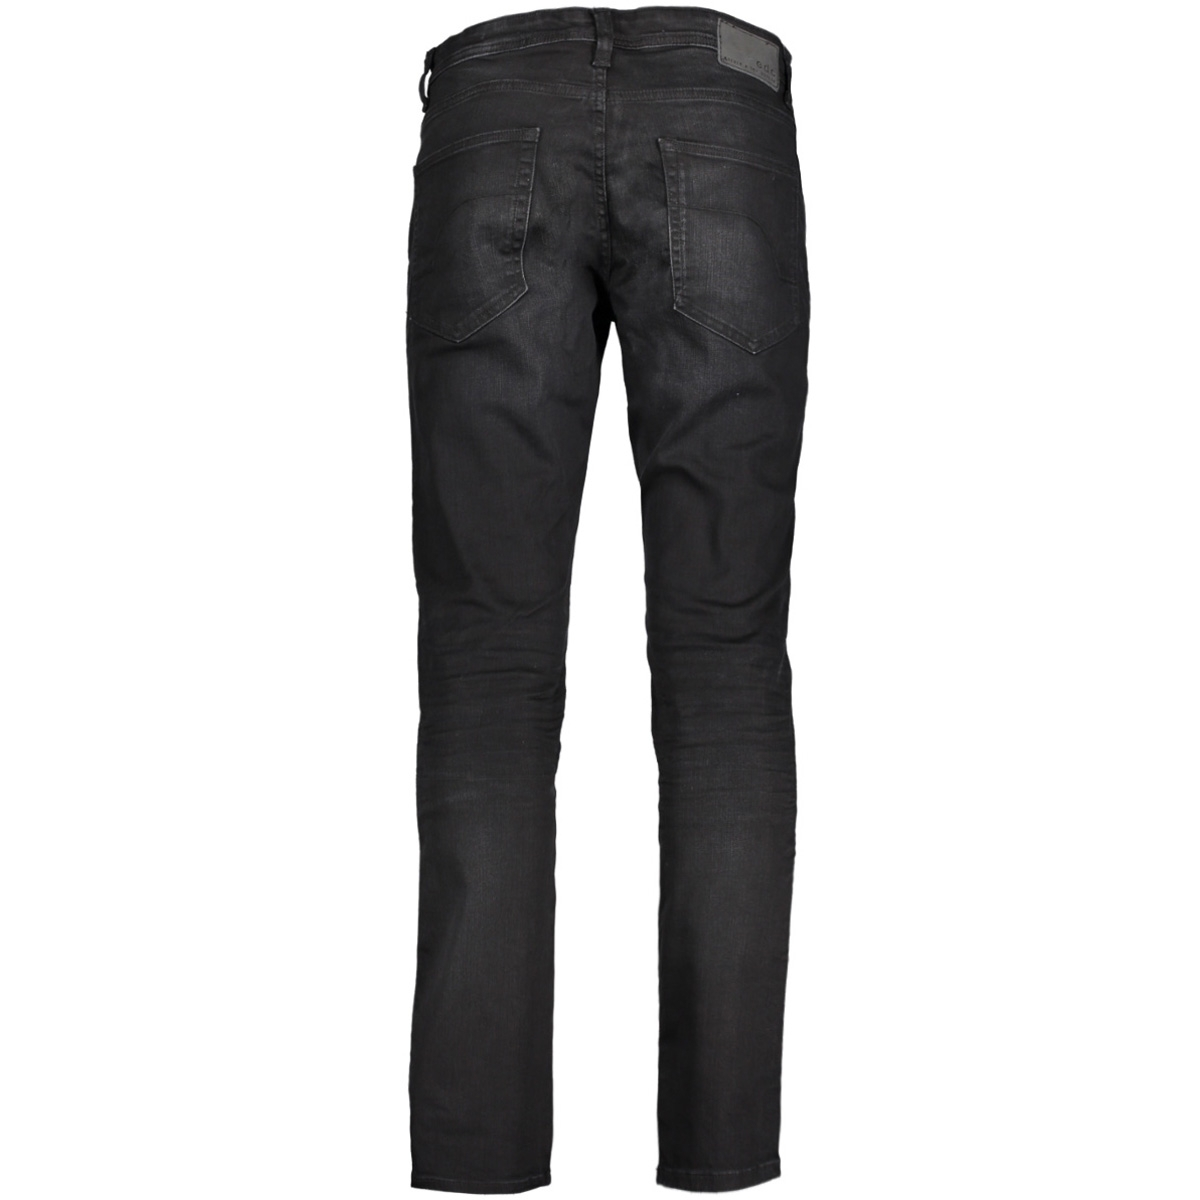 107cc2b011 edc jeans c911